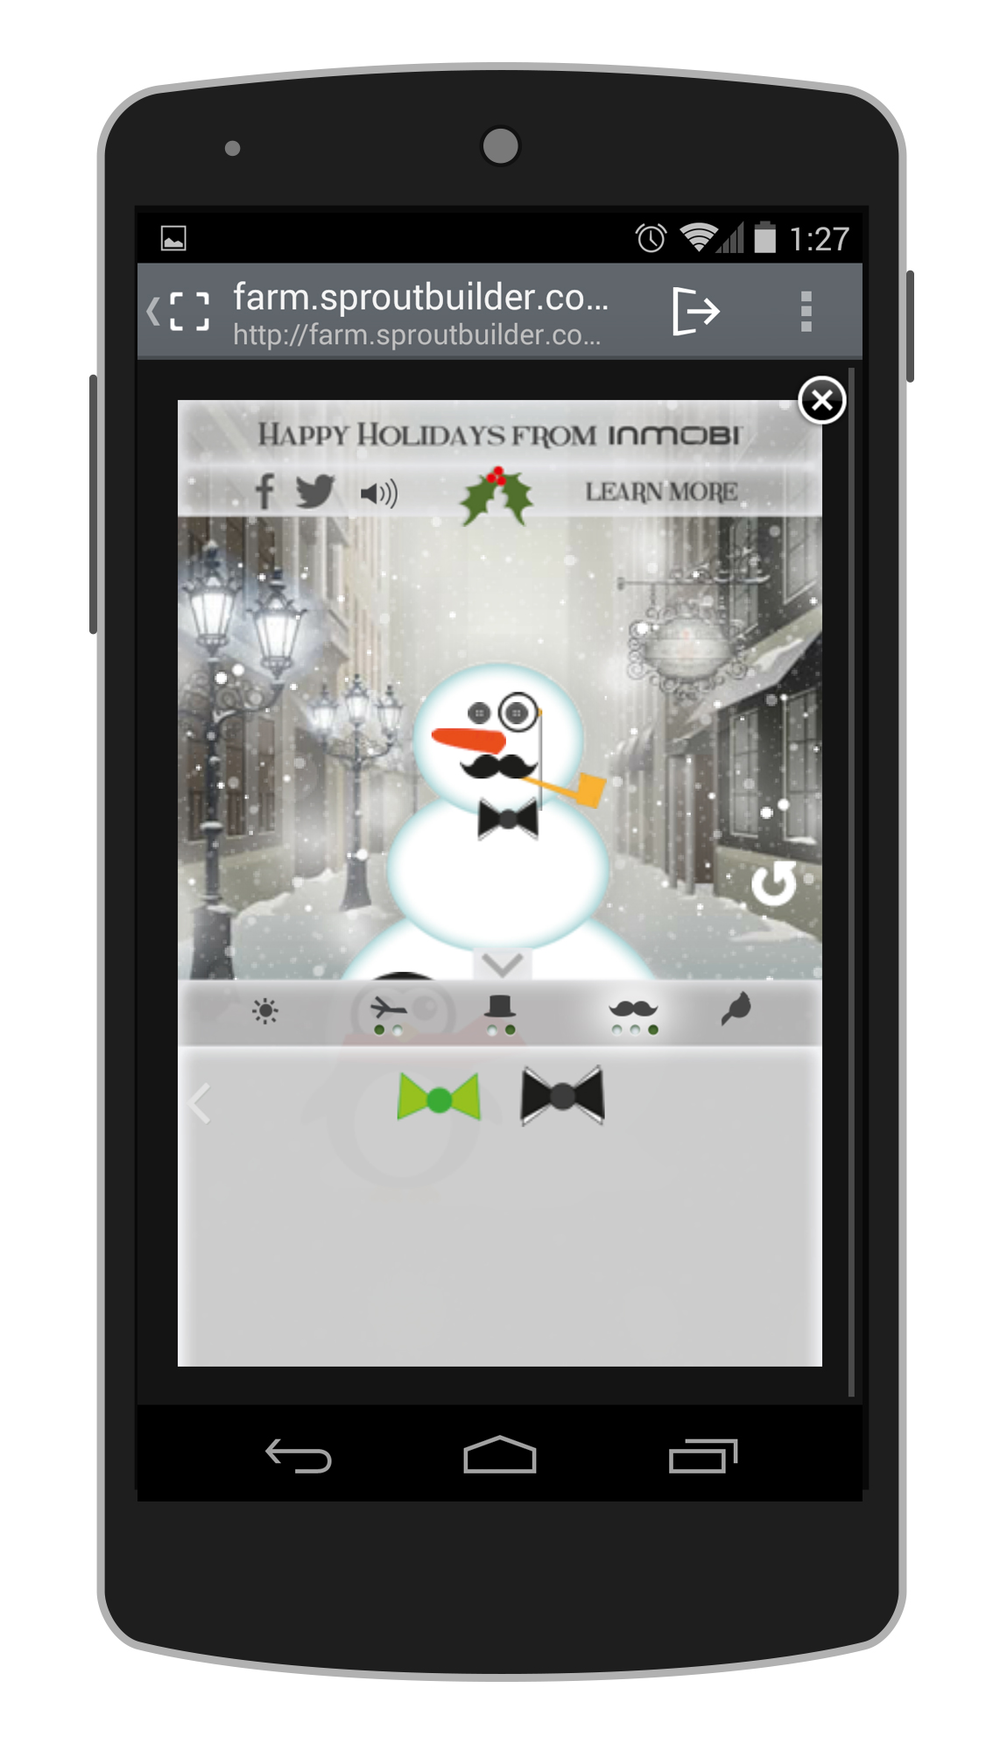 inmobi christmas card build a snowman emedesigns